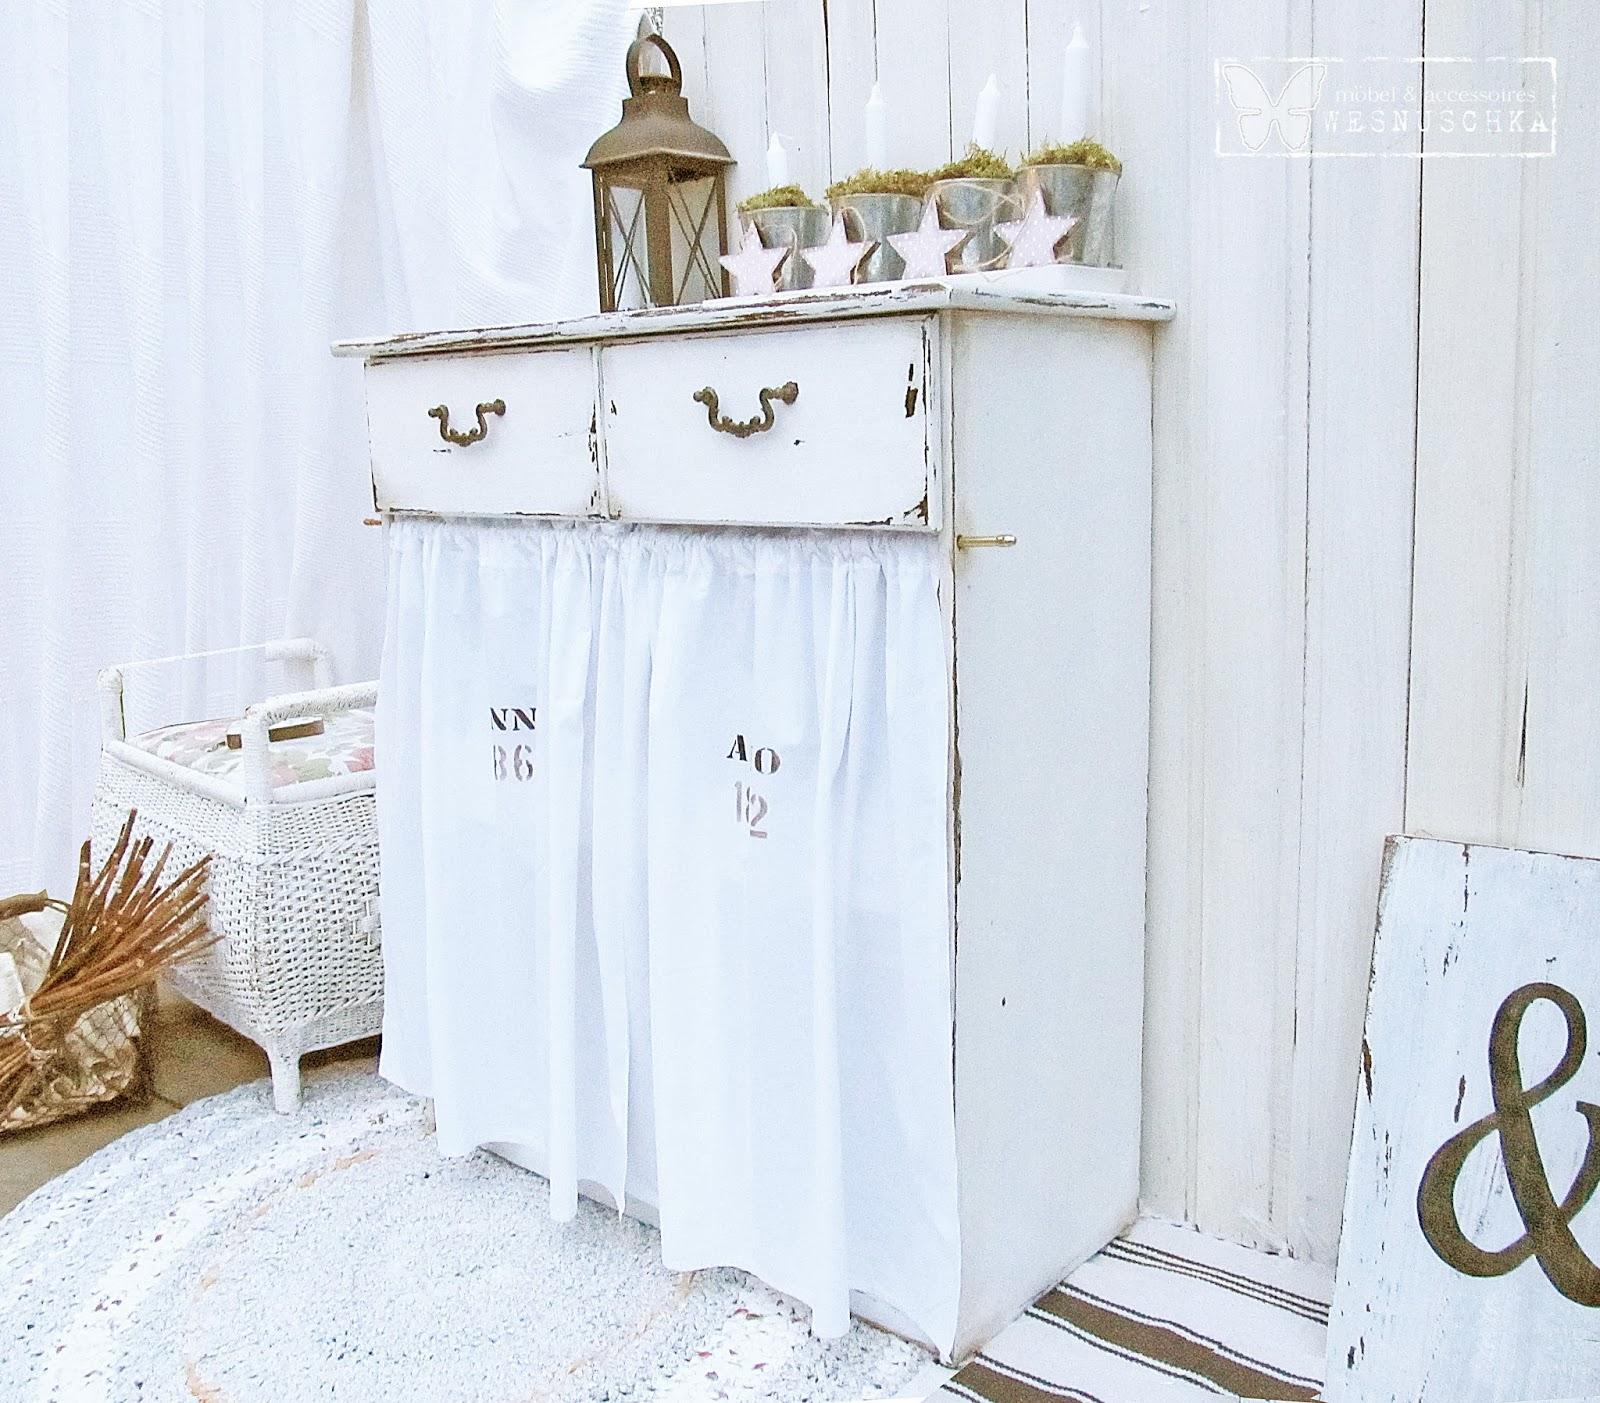 gro z gig shabby chic schrank ideen heimat ideen. Black Bedroom Furniture Sets. Home Design Ideas